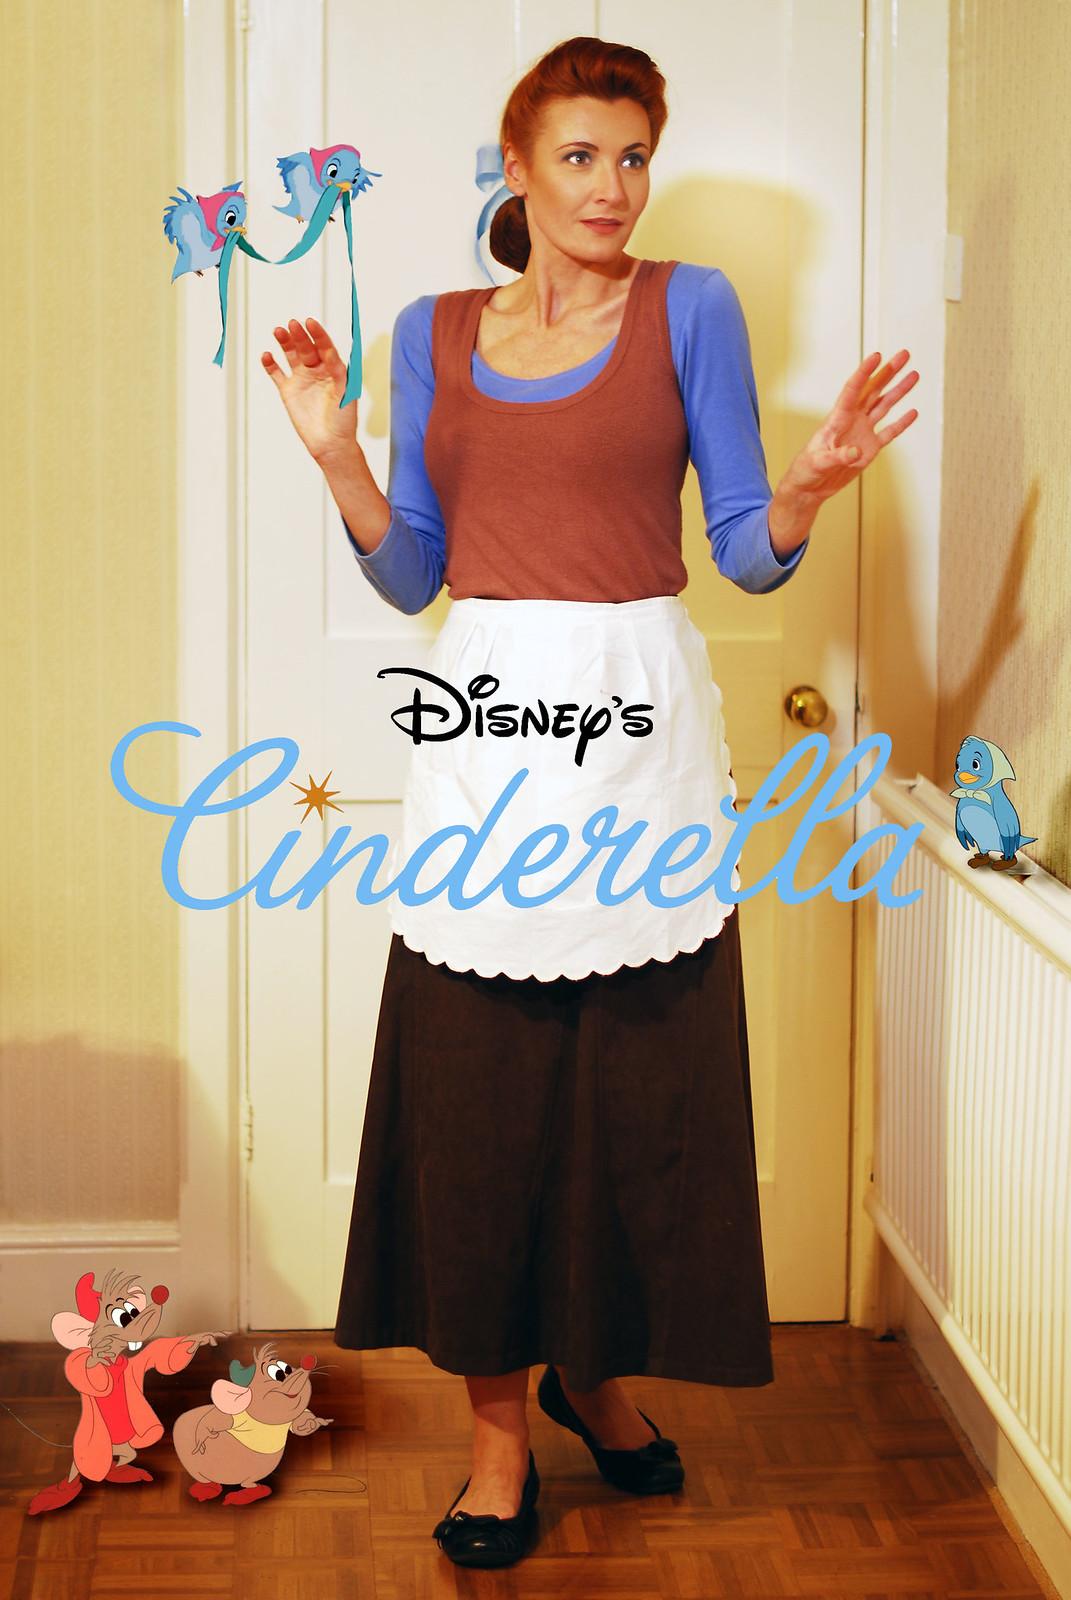 Cinderella in rags fancy dress costume